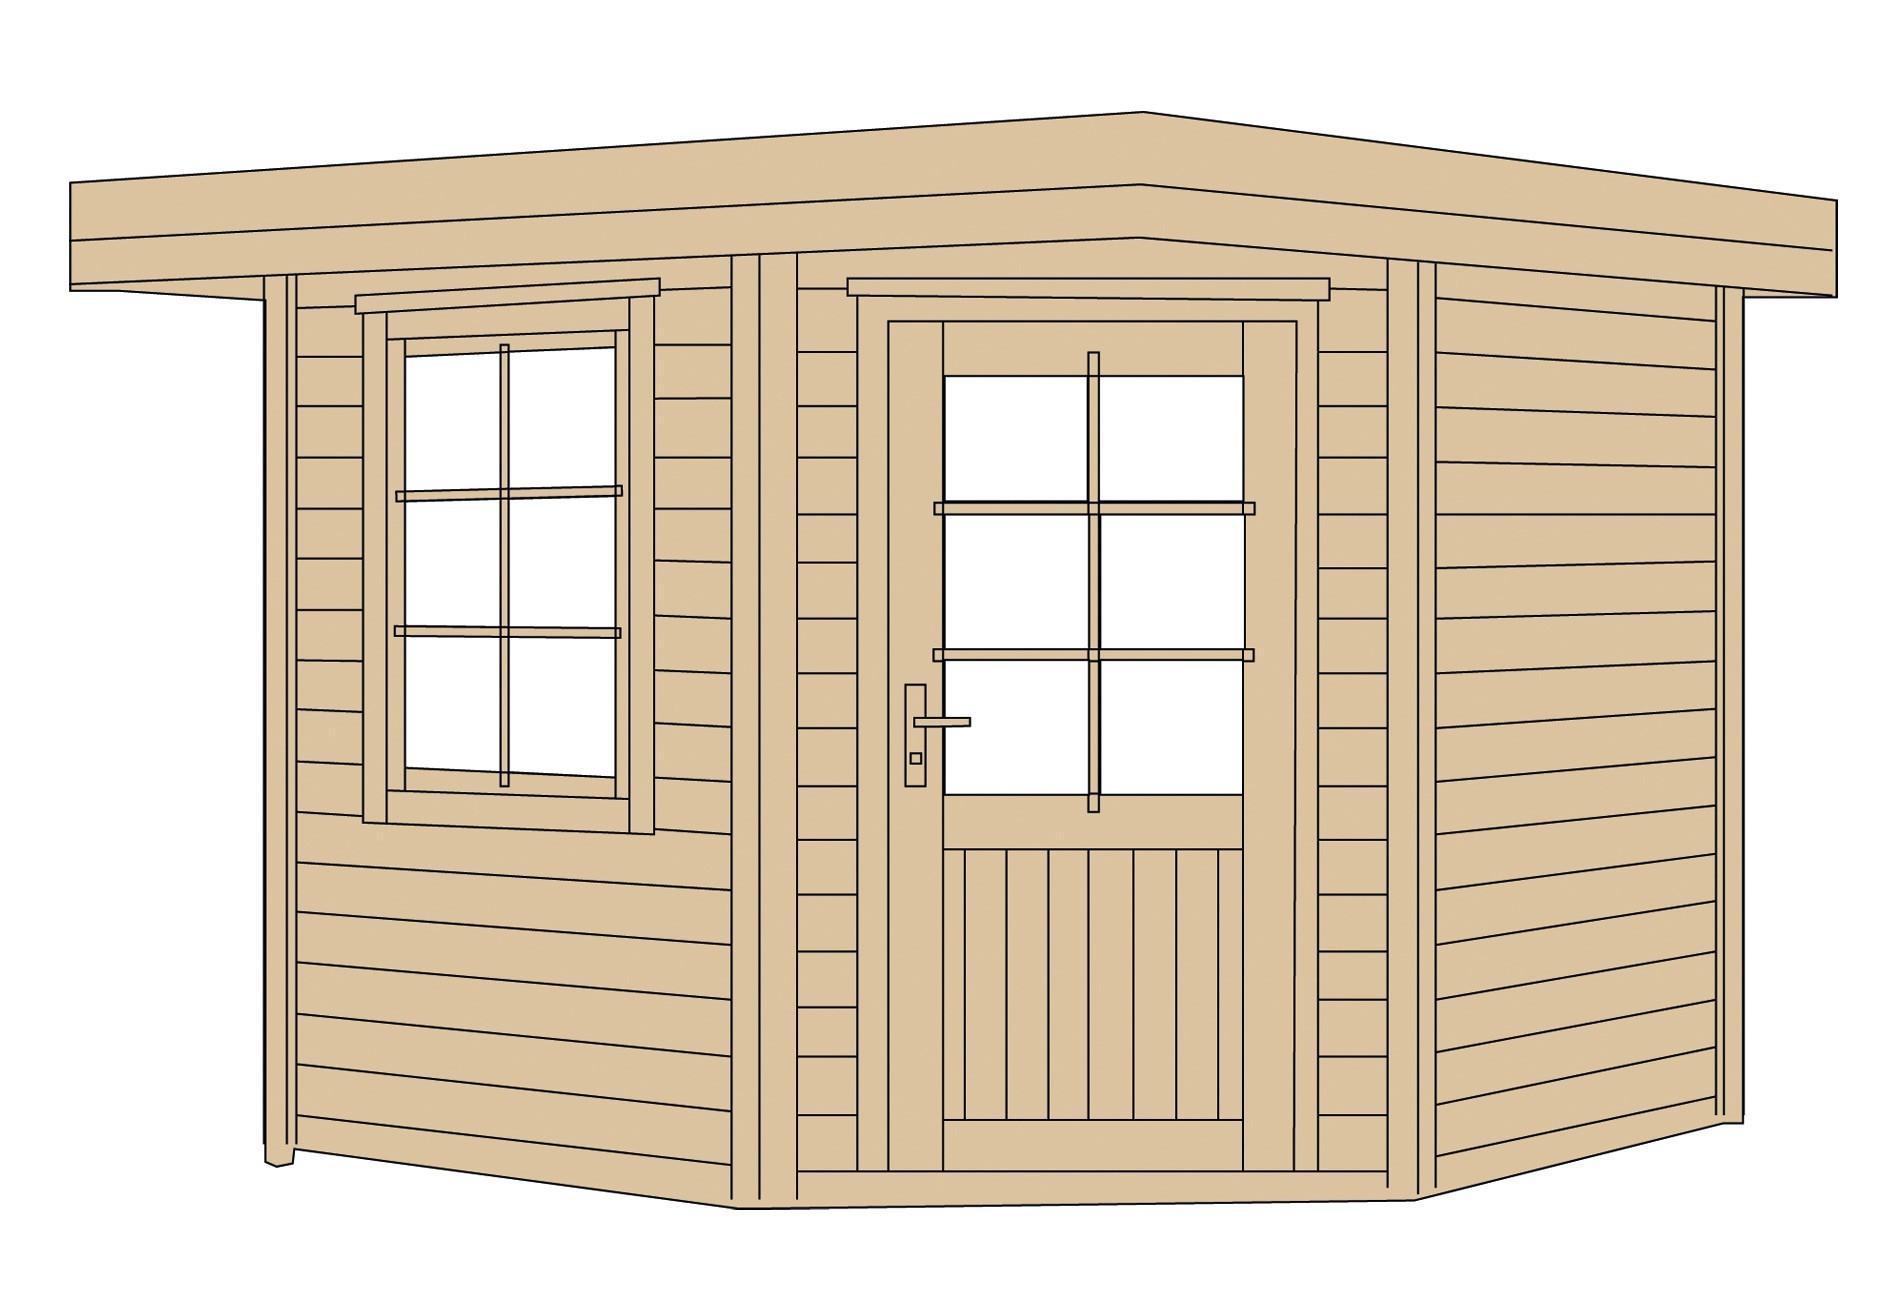 weka gartenhaus 28mm fides 1 gr 2 grau 338x338cm vd 50cm. Black Bedroom Furniture Sets. Home Design Ideas